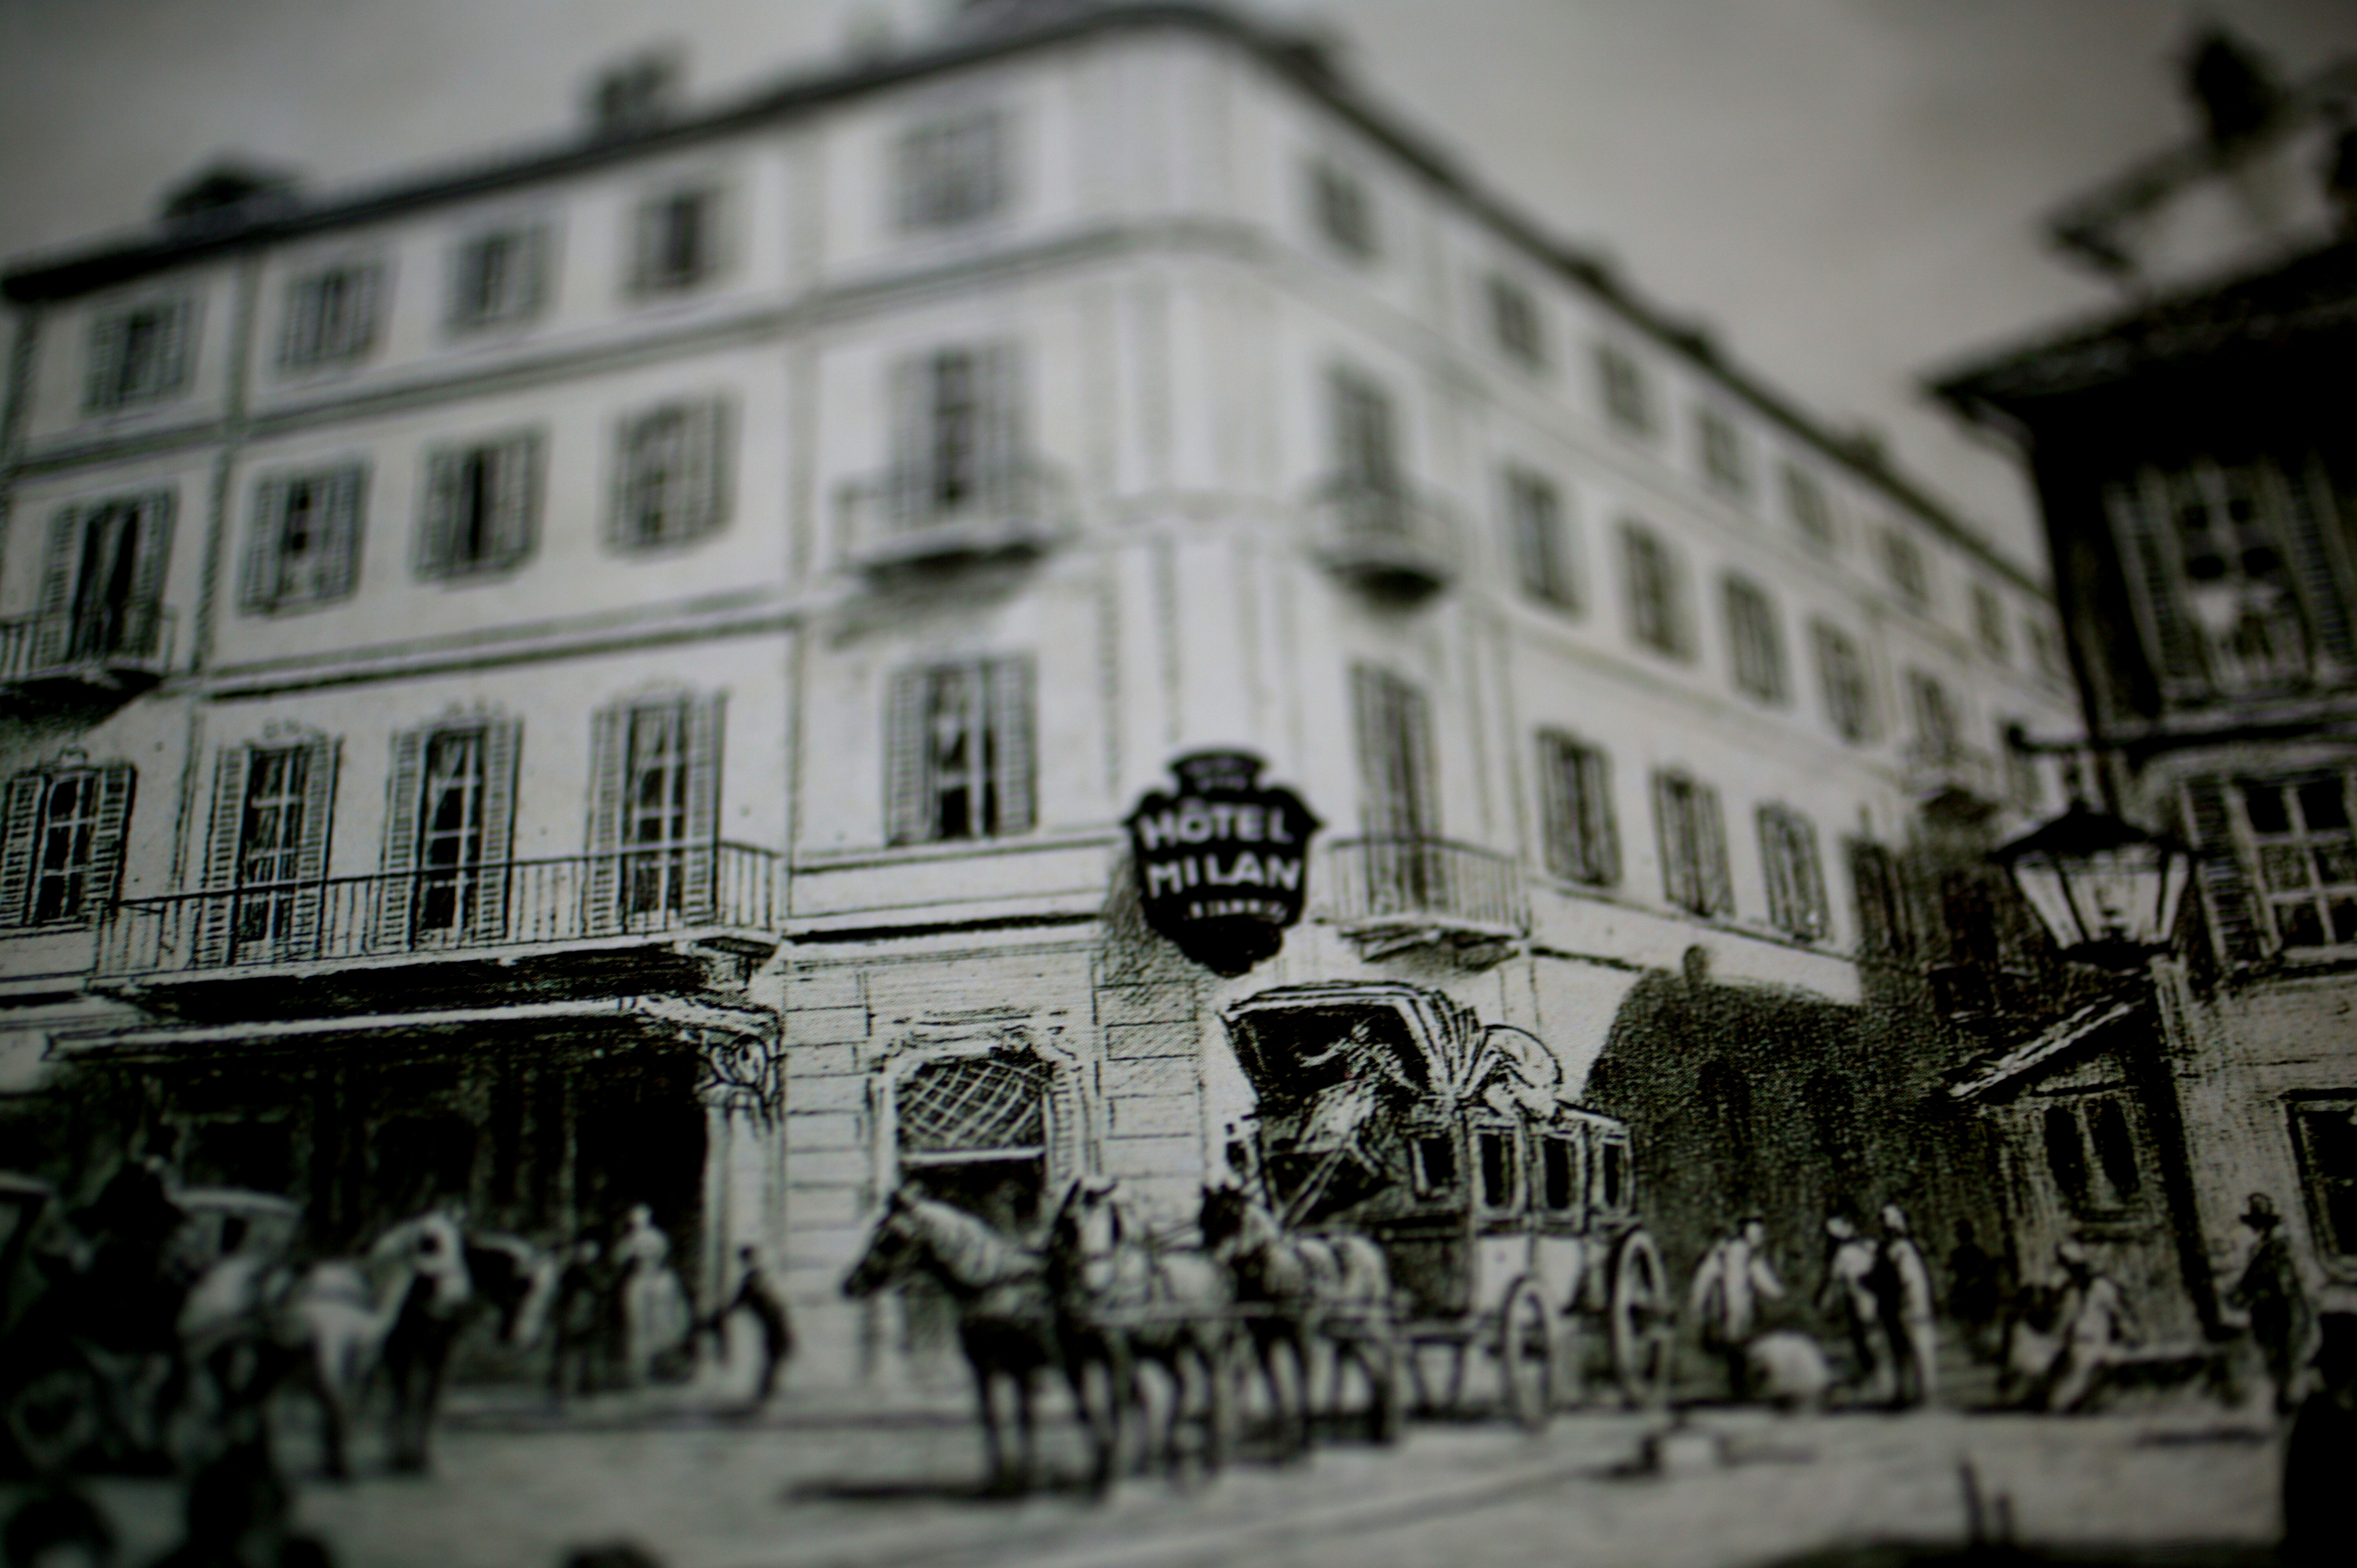 grand-hotel-et-de-milan_fine-1800